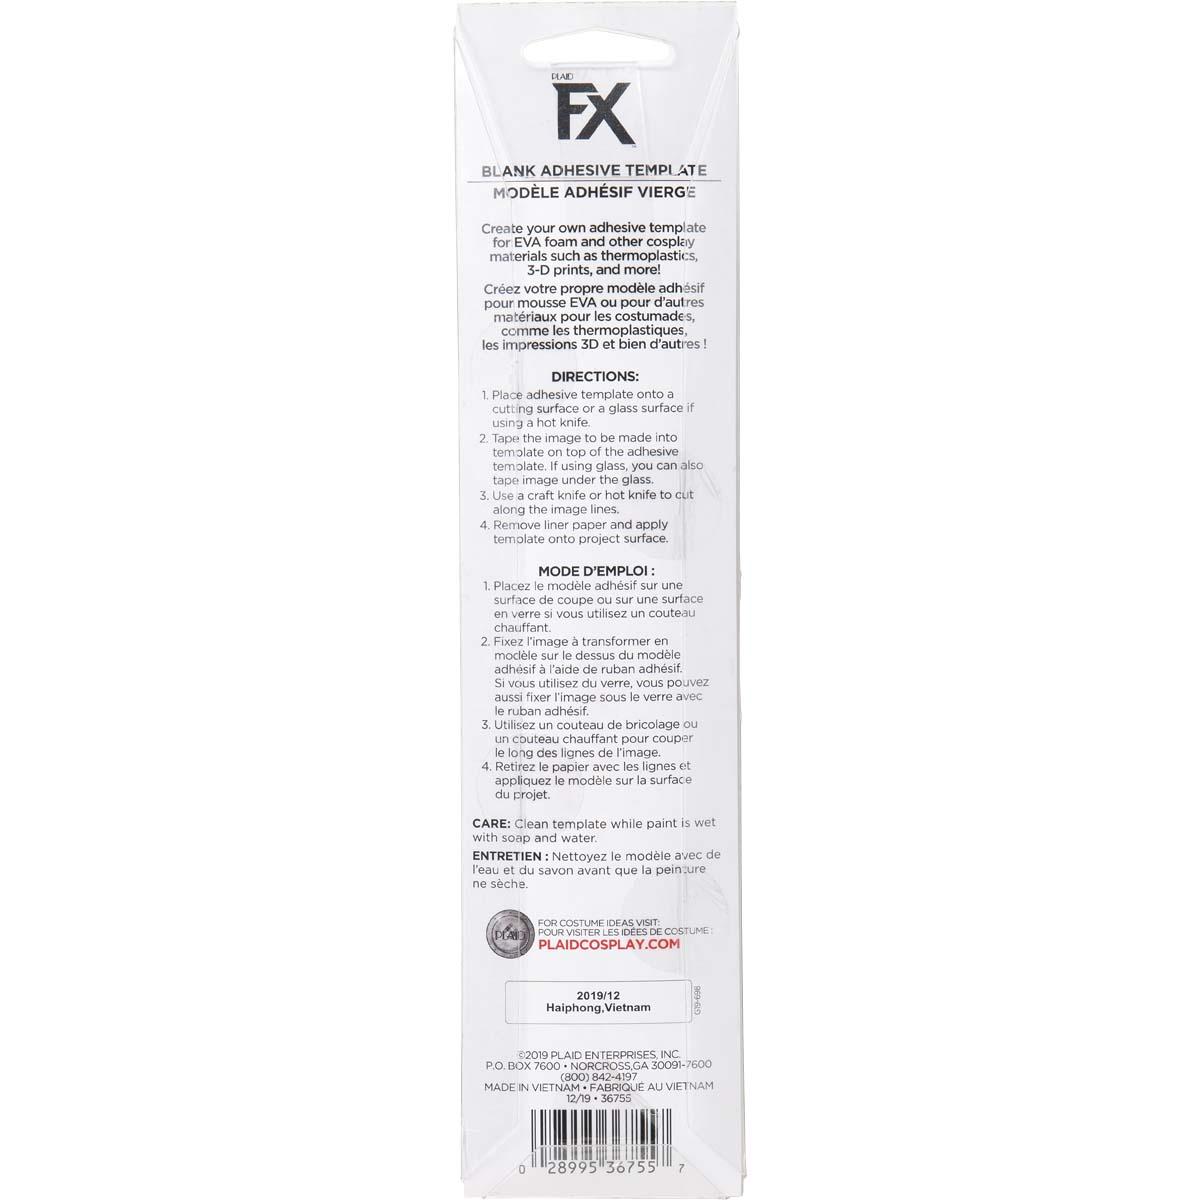 PlaidFX Blank Adhesive Template, 8-1/4